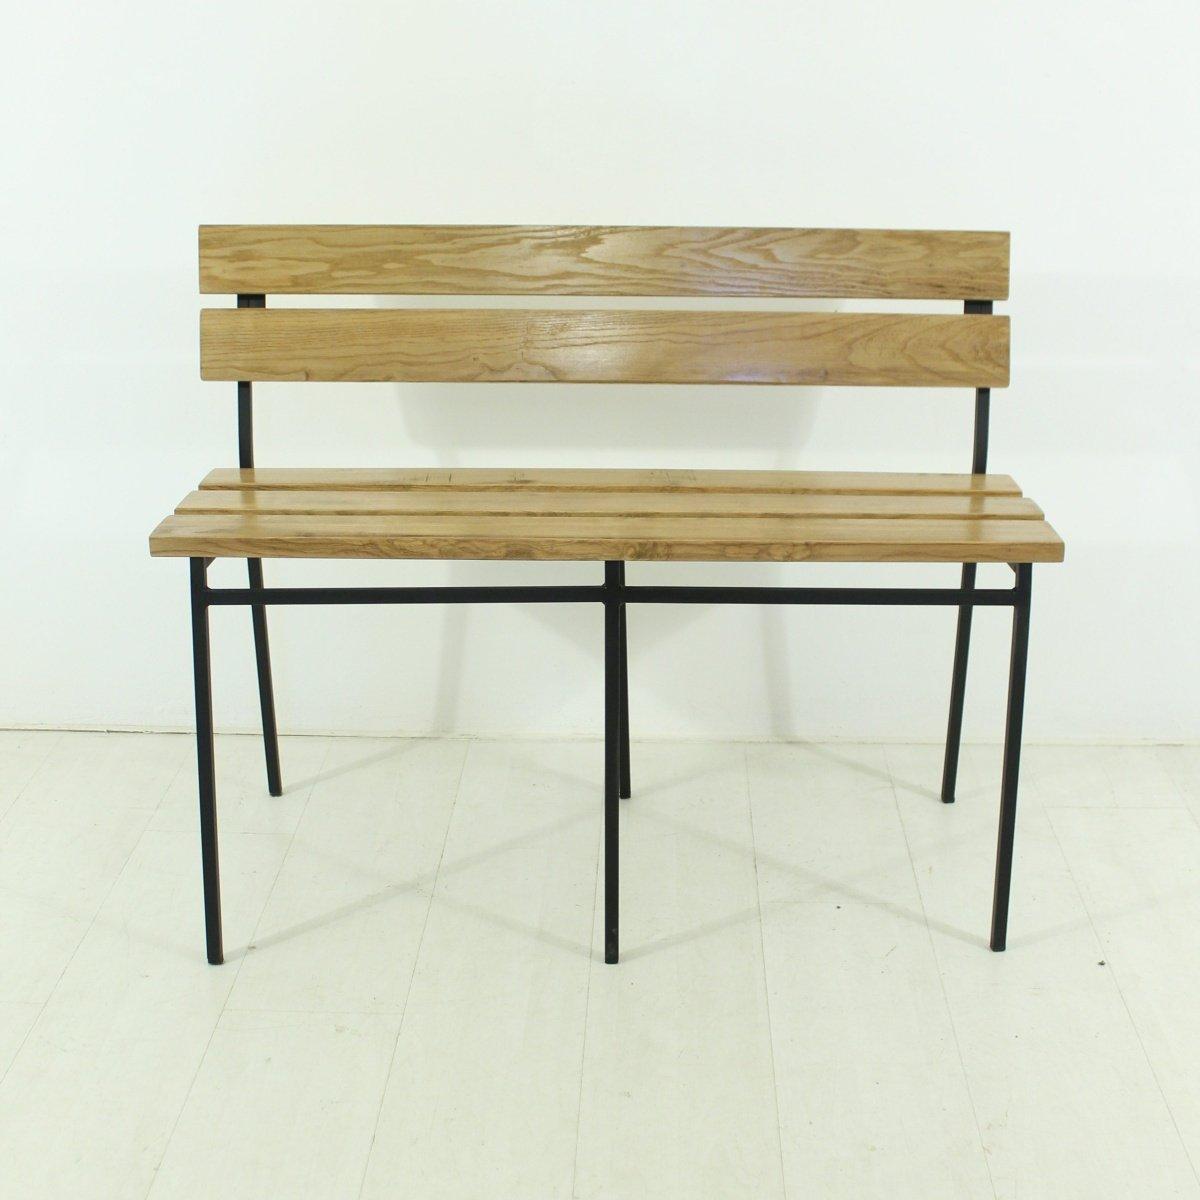 banc en ch ne 1960s en vente sur pamono. Black Bedroom Furniture Sets. Home Design Ideas